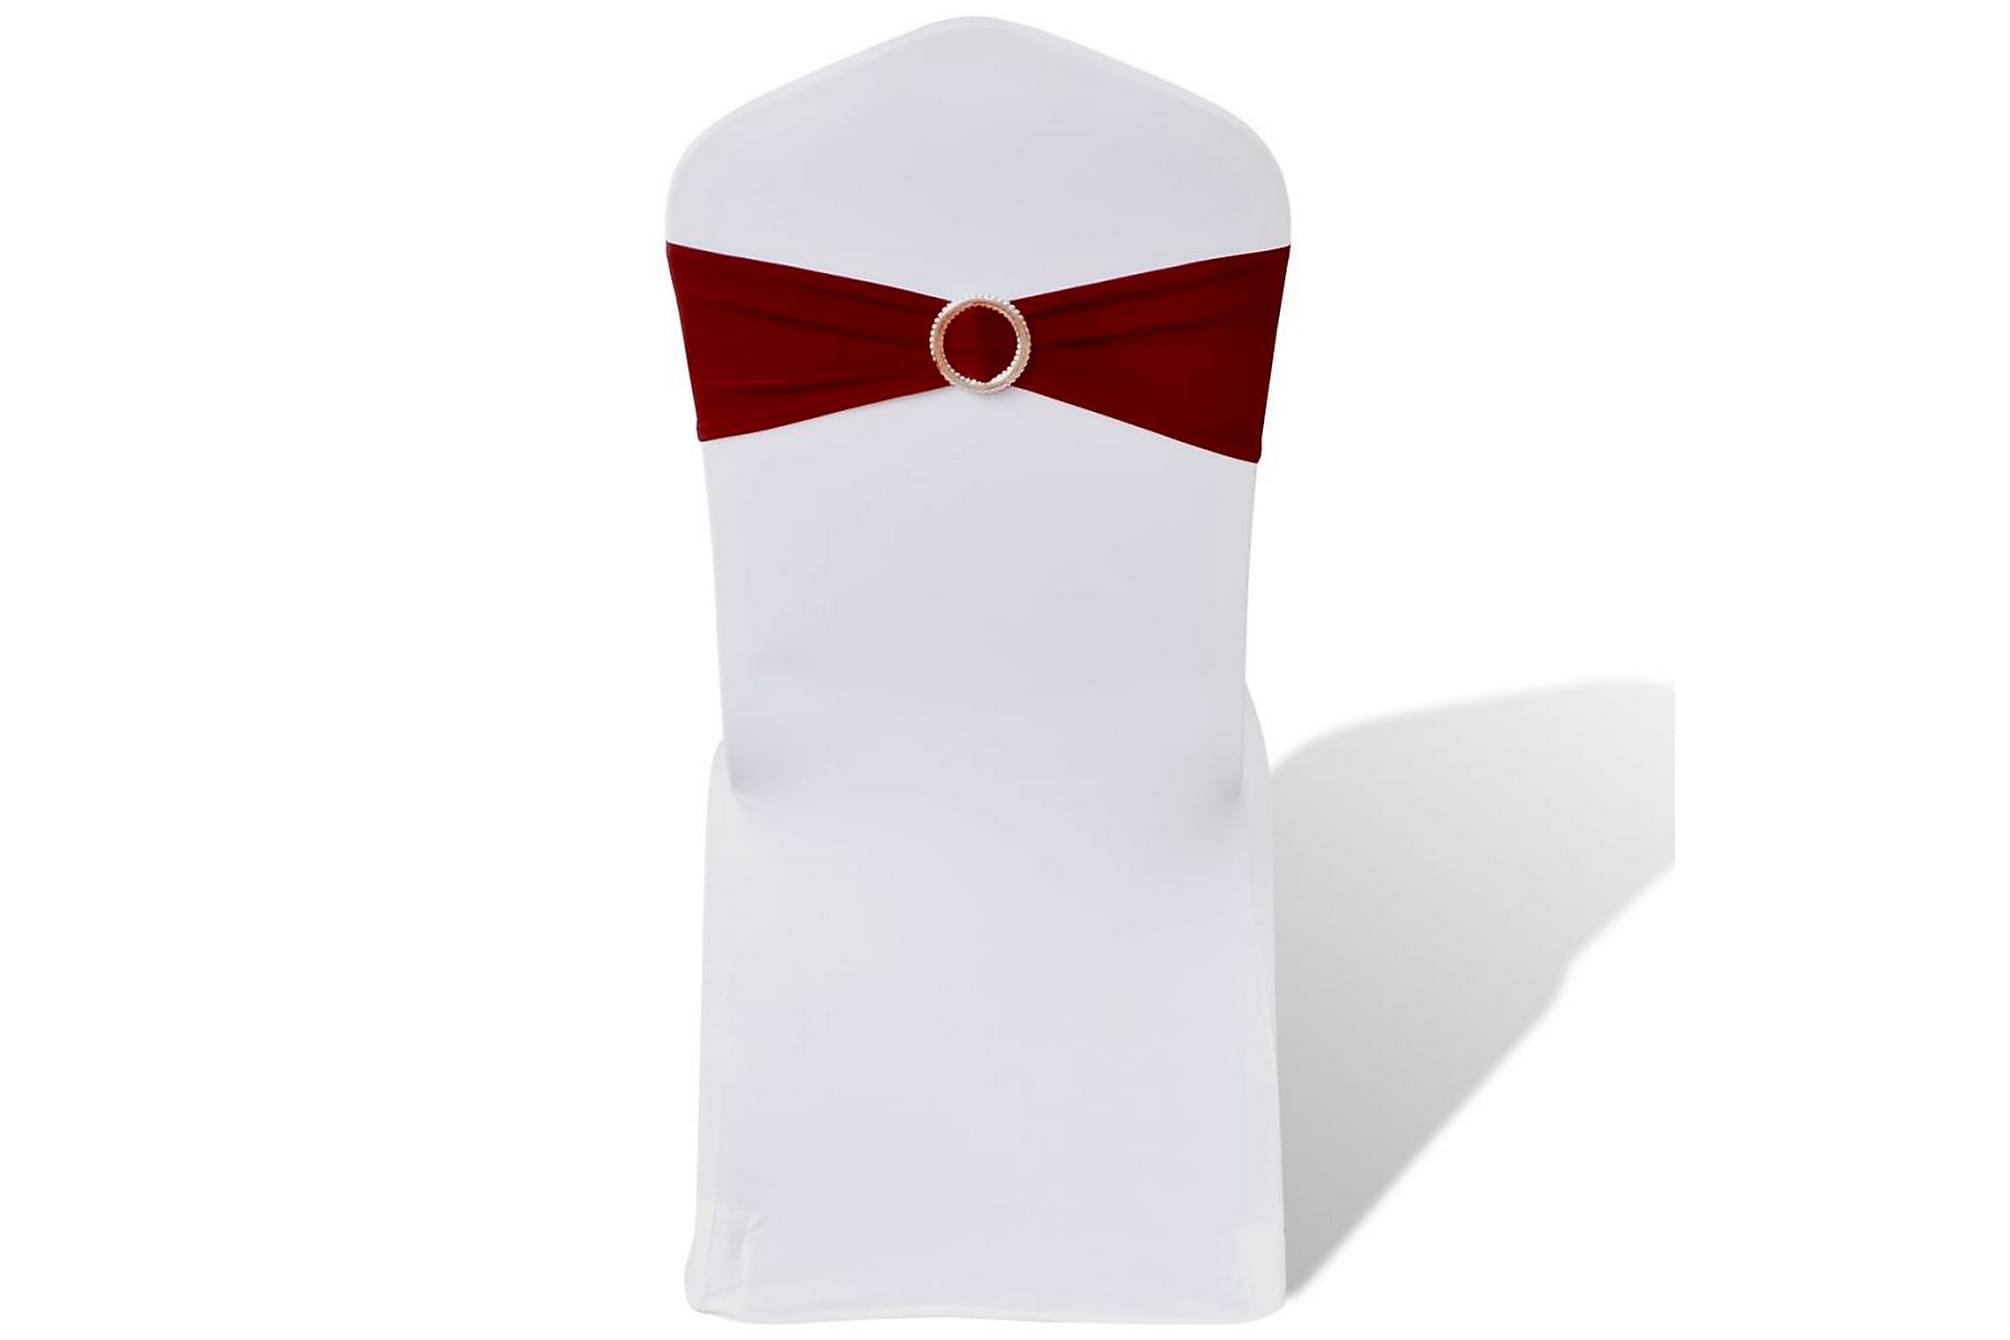 25 st vinröda dekorativa stolsband med diamantspänne